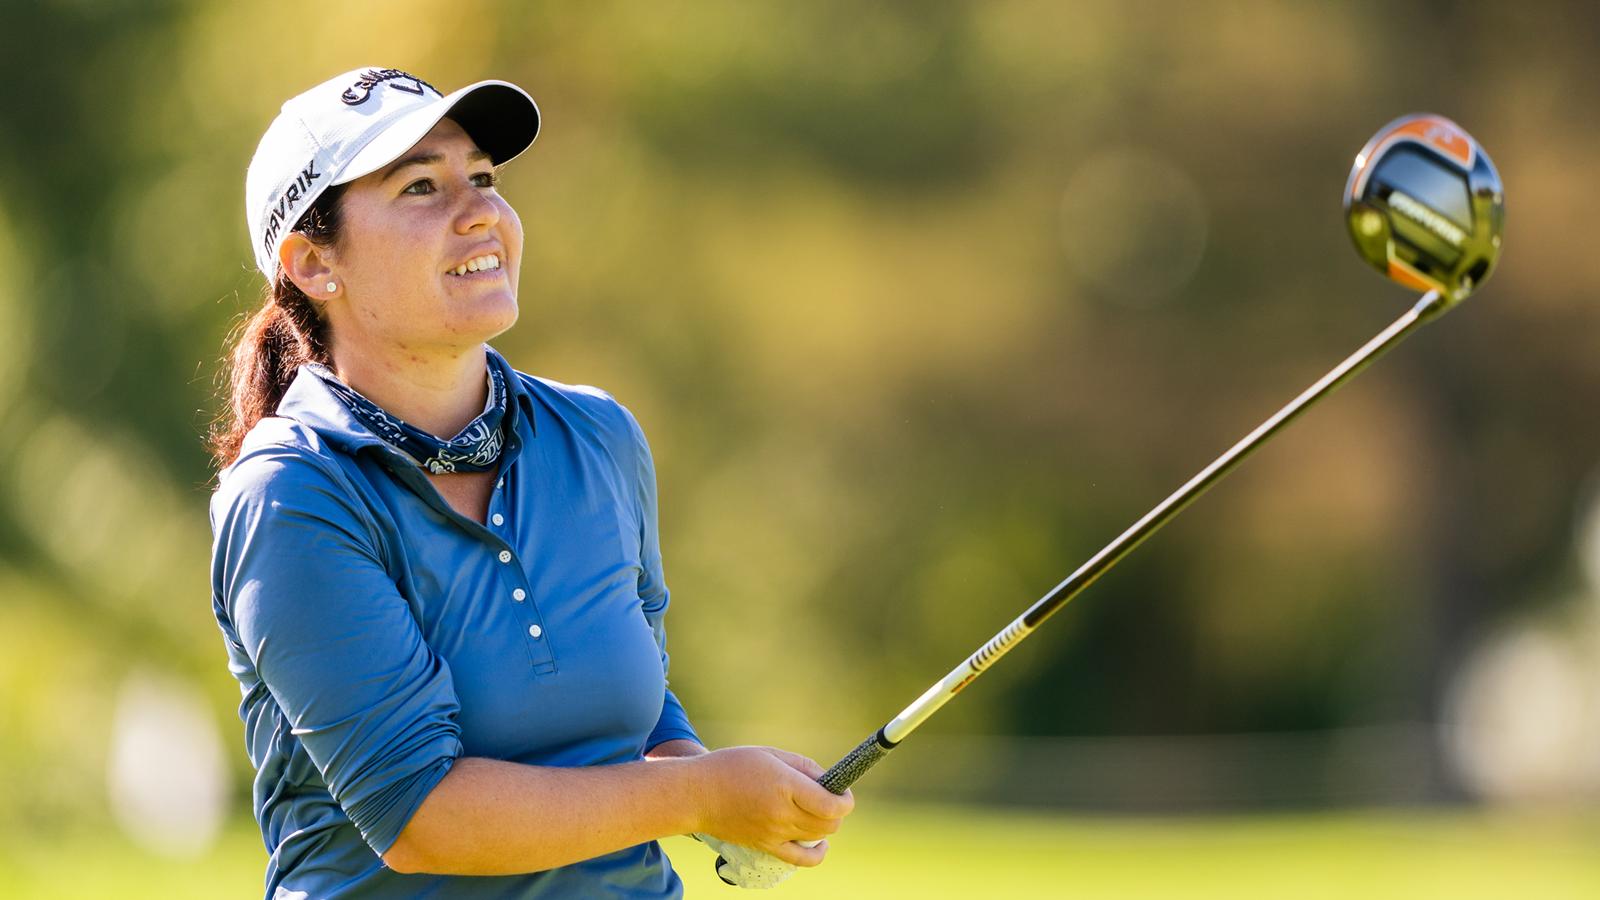 Samantha Morrell, LPGA